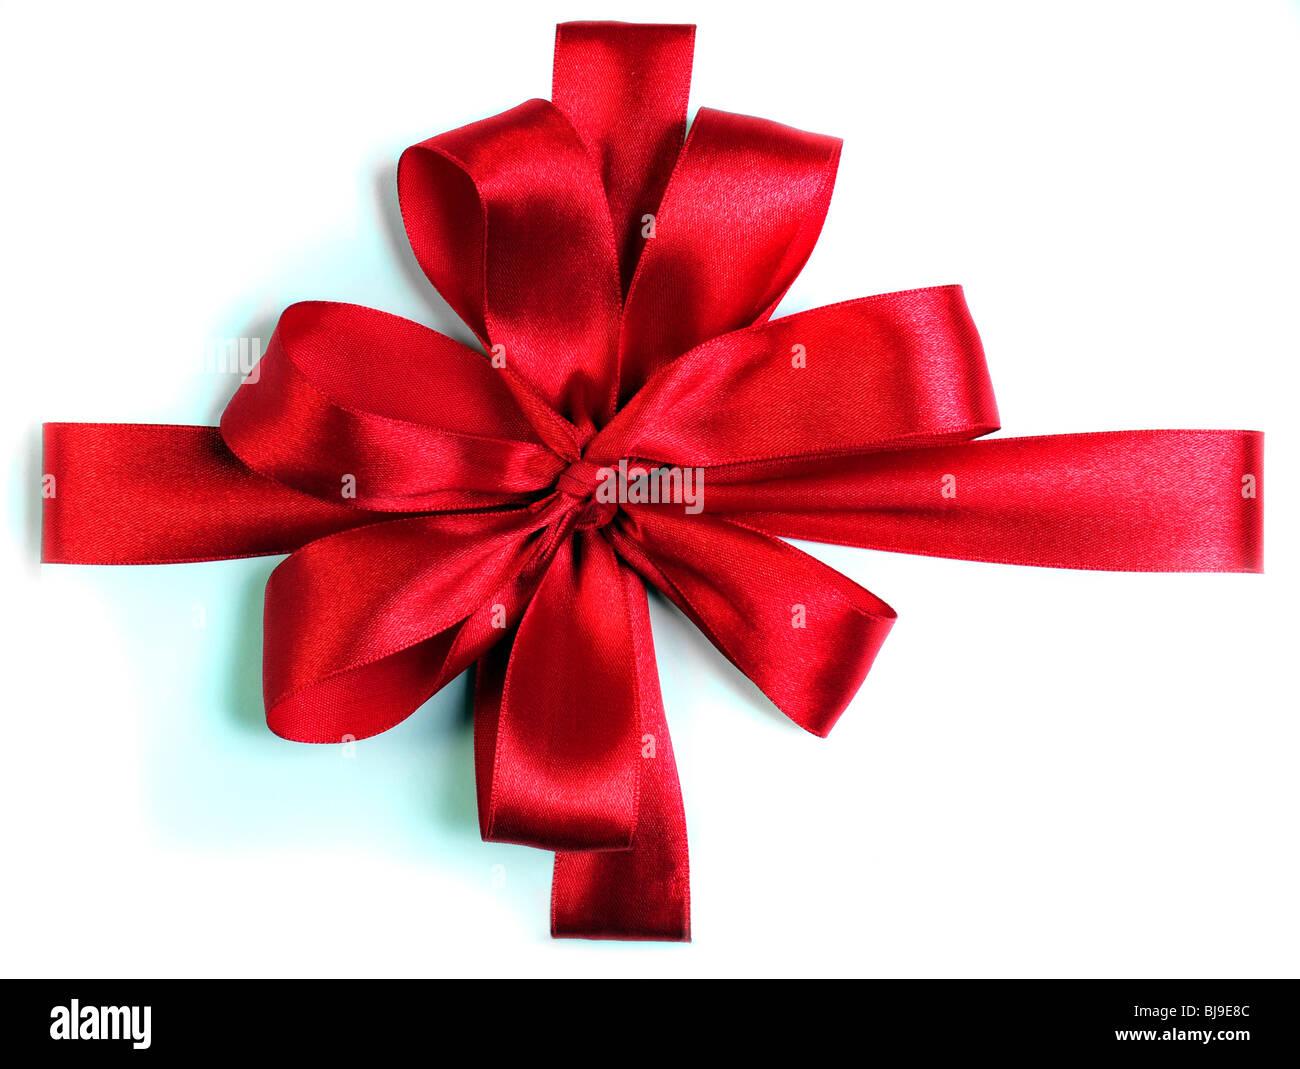 Arc ruban rouge sur fond blanc Photo Stock